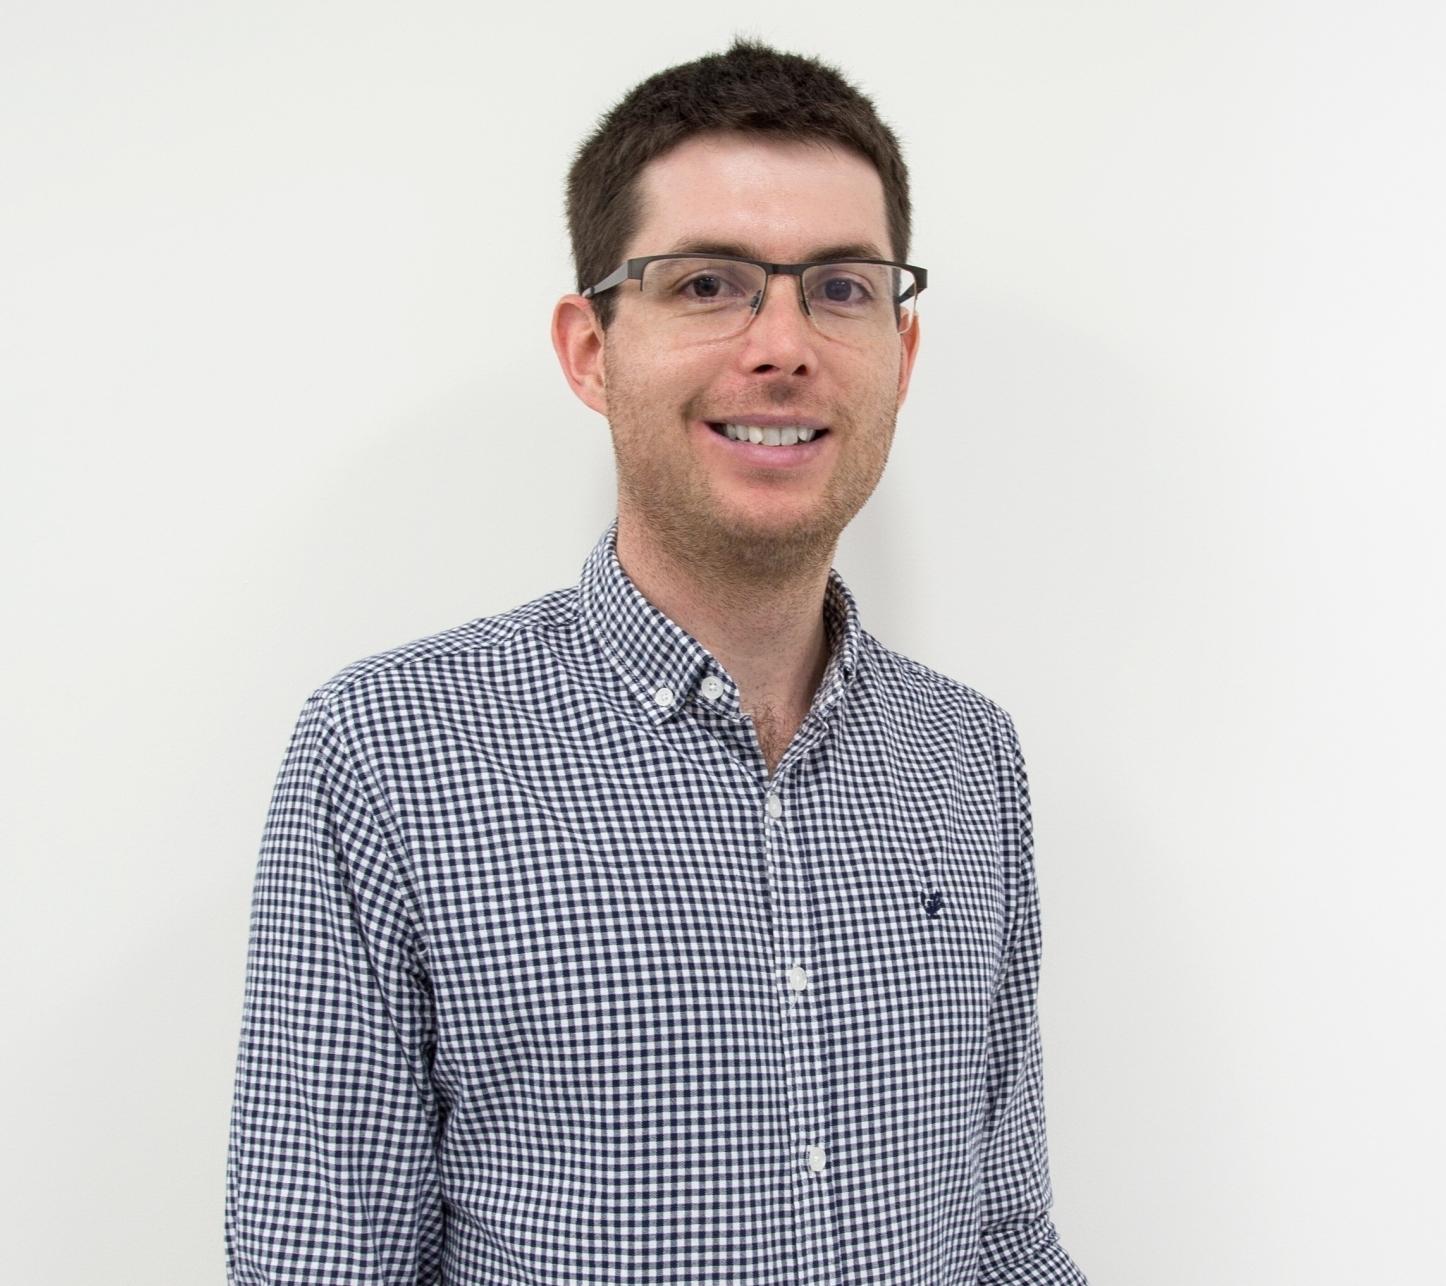 Dr Kieran Talbot